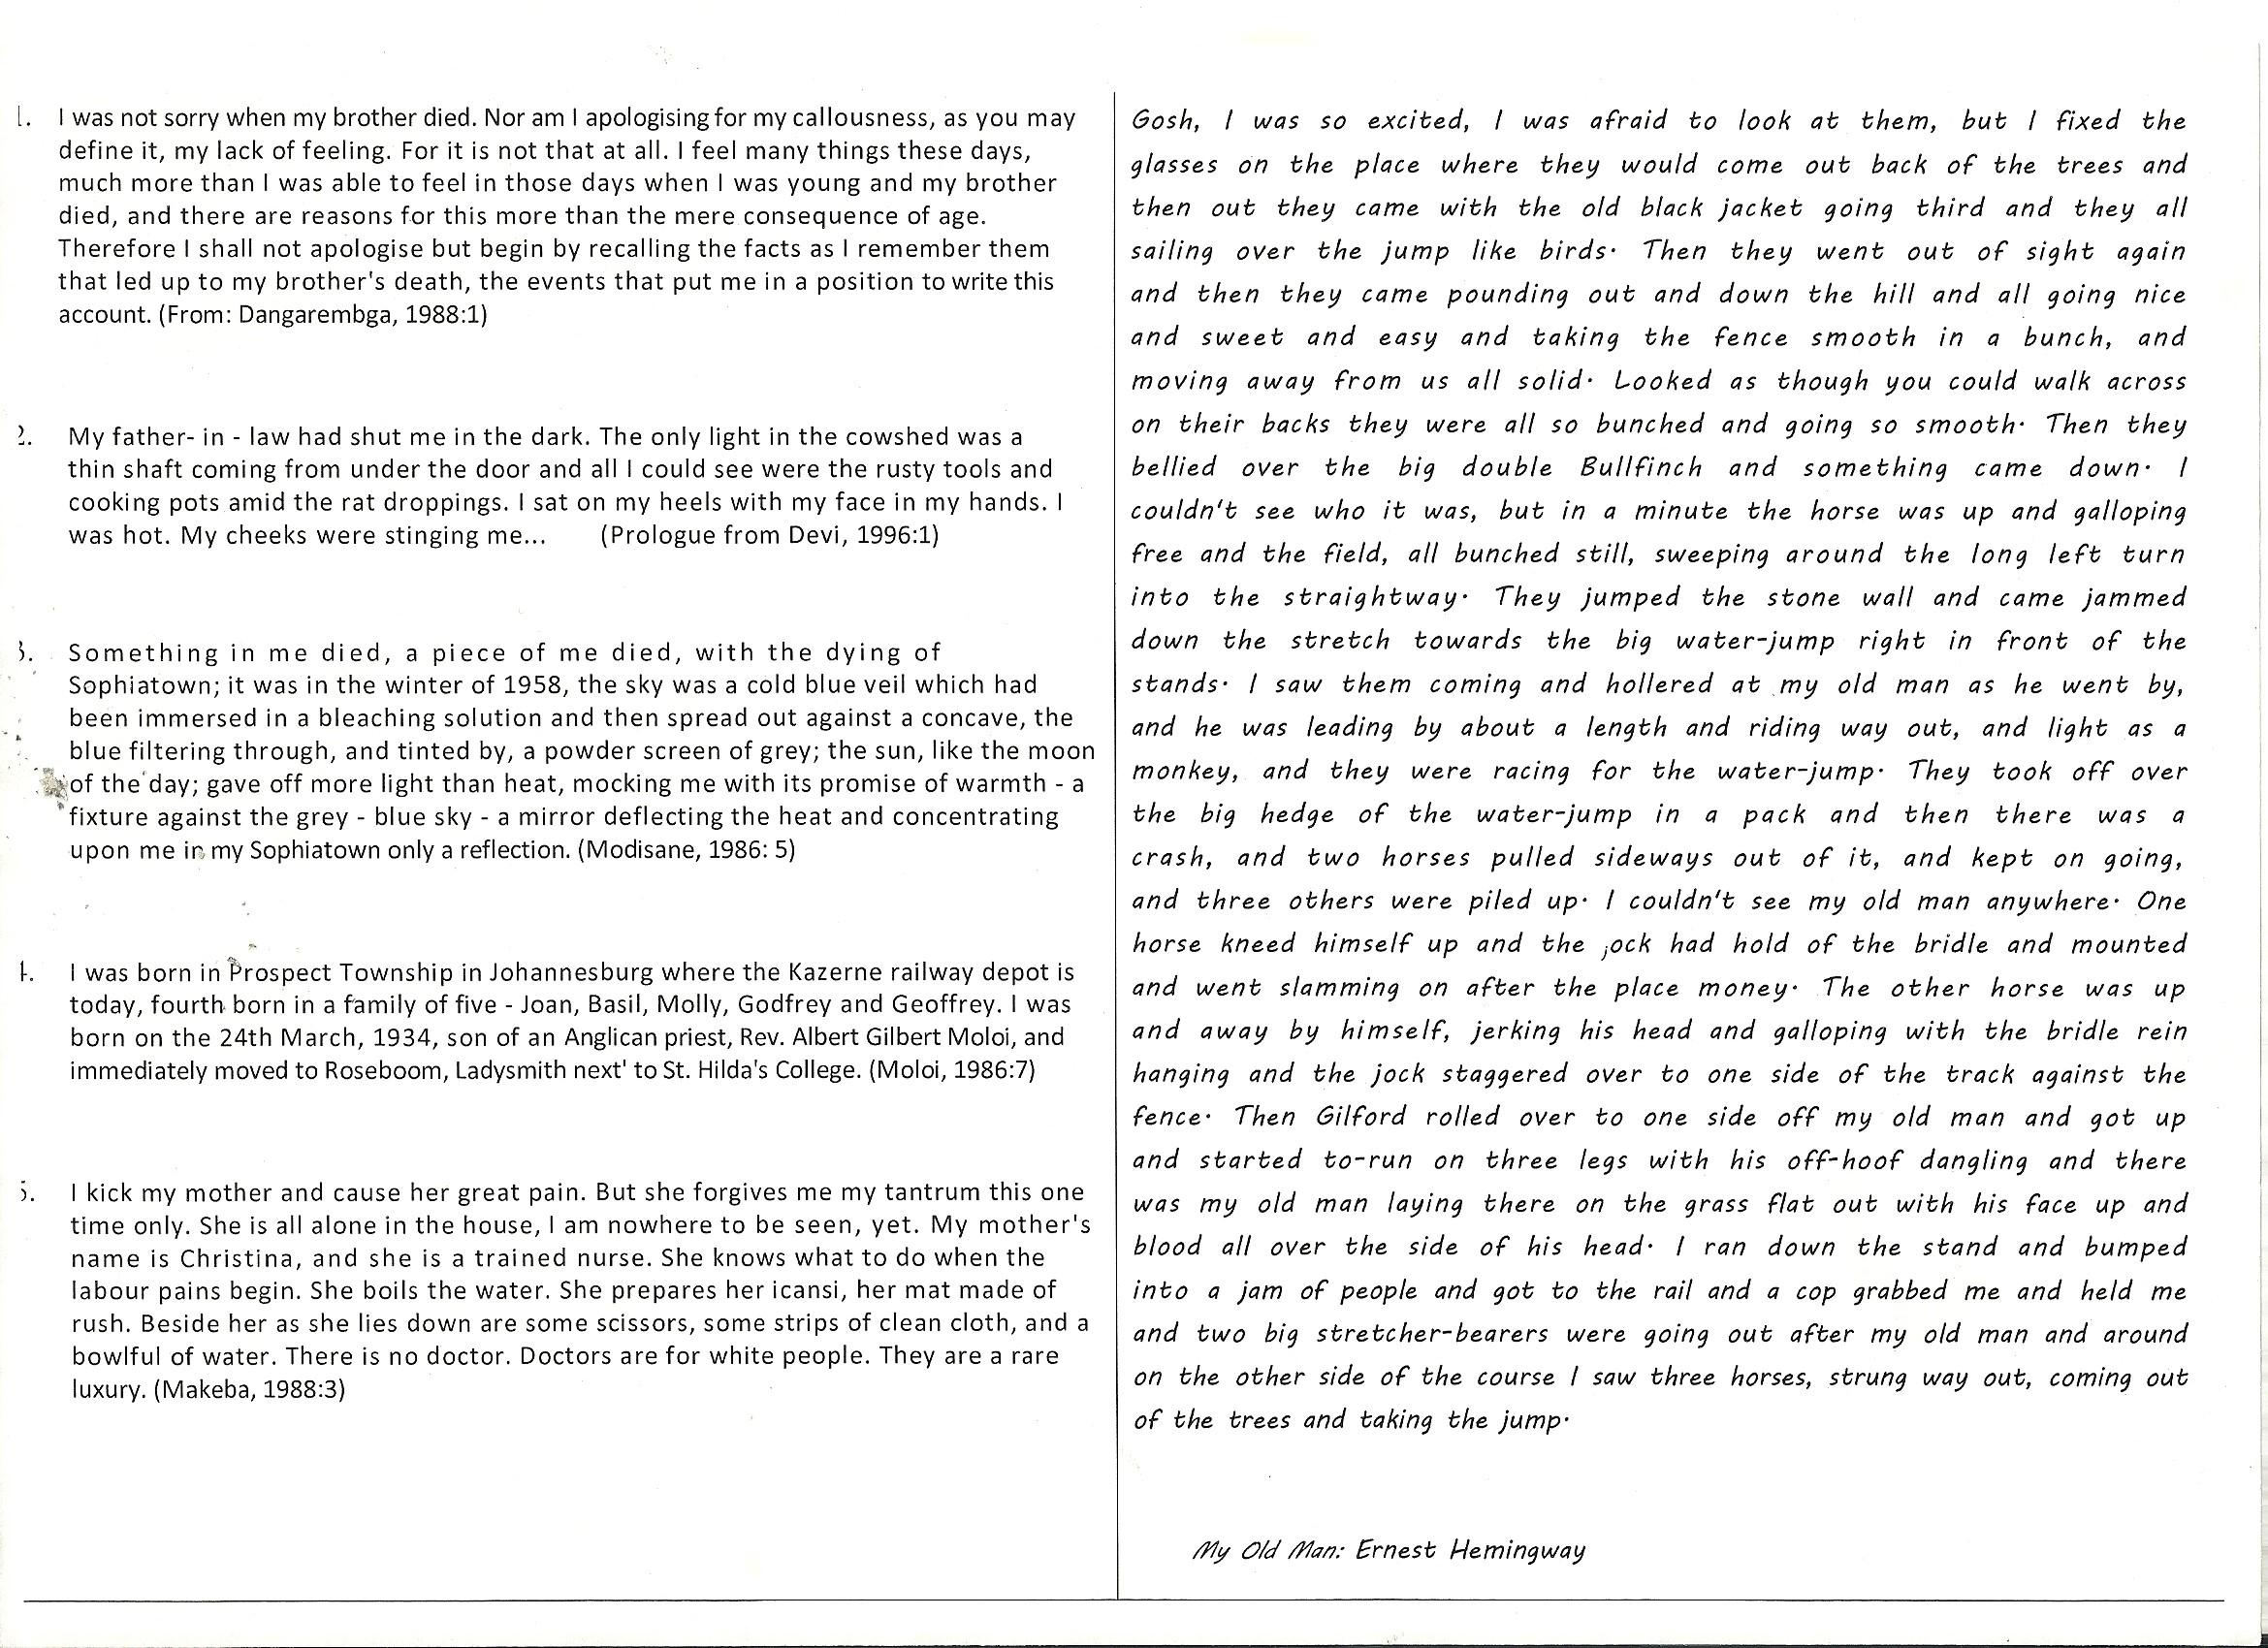 013 Essay Example Paragraph College Good Vs Excellent 5 Pdf Full